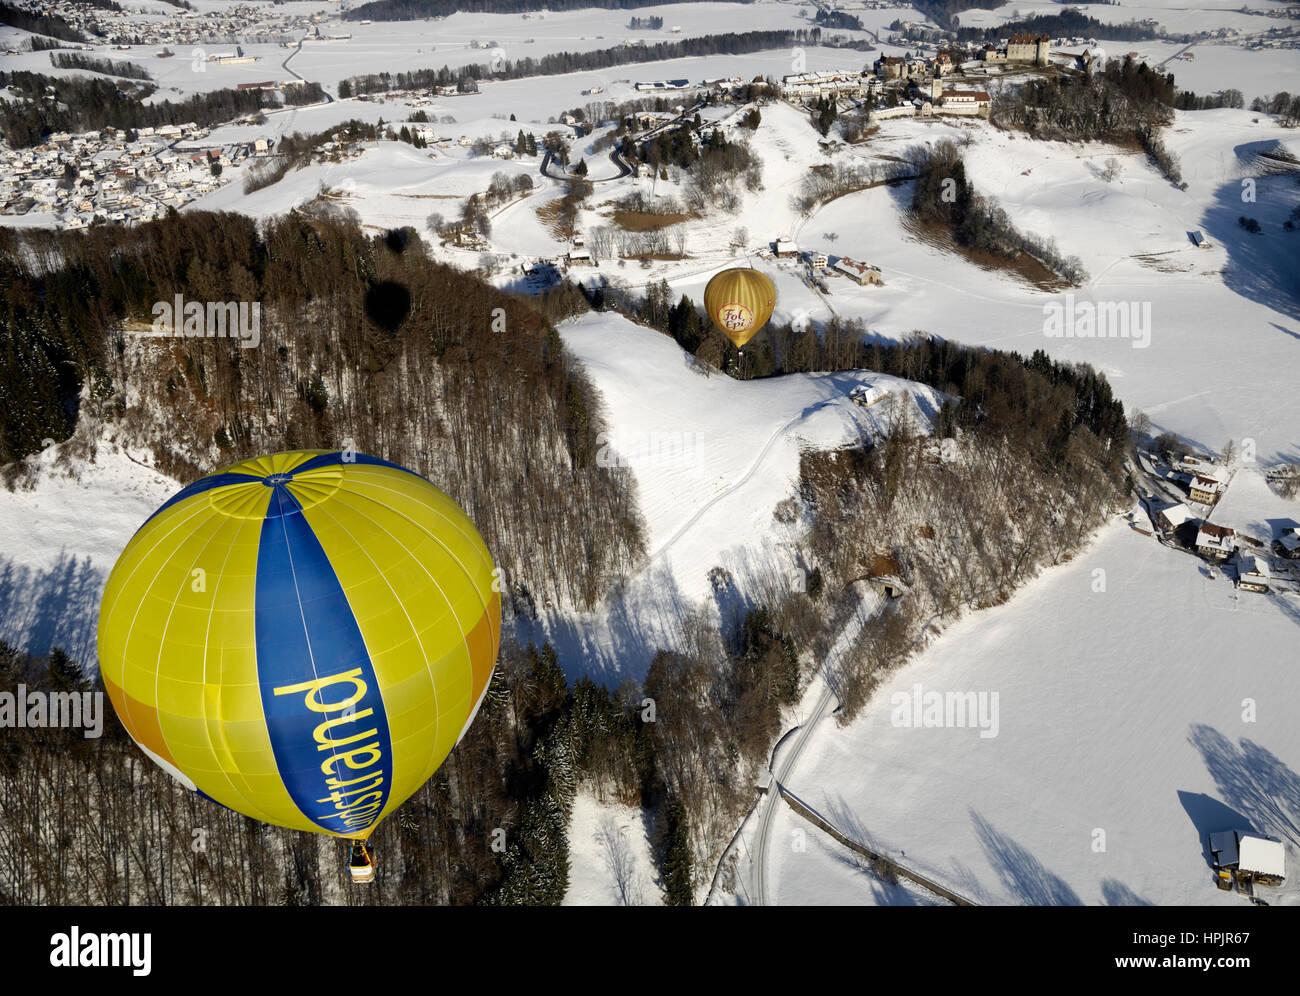 Gruyère: Chateau d'Oex International Balloon Festival / Festival International de Ballons à Château-d'Oex Foto Stock